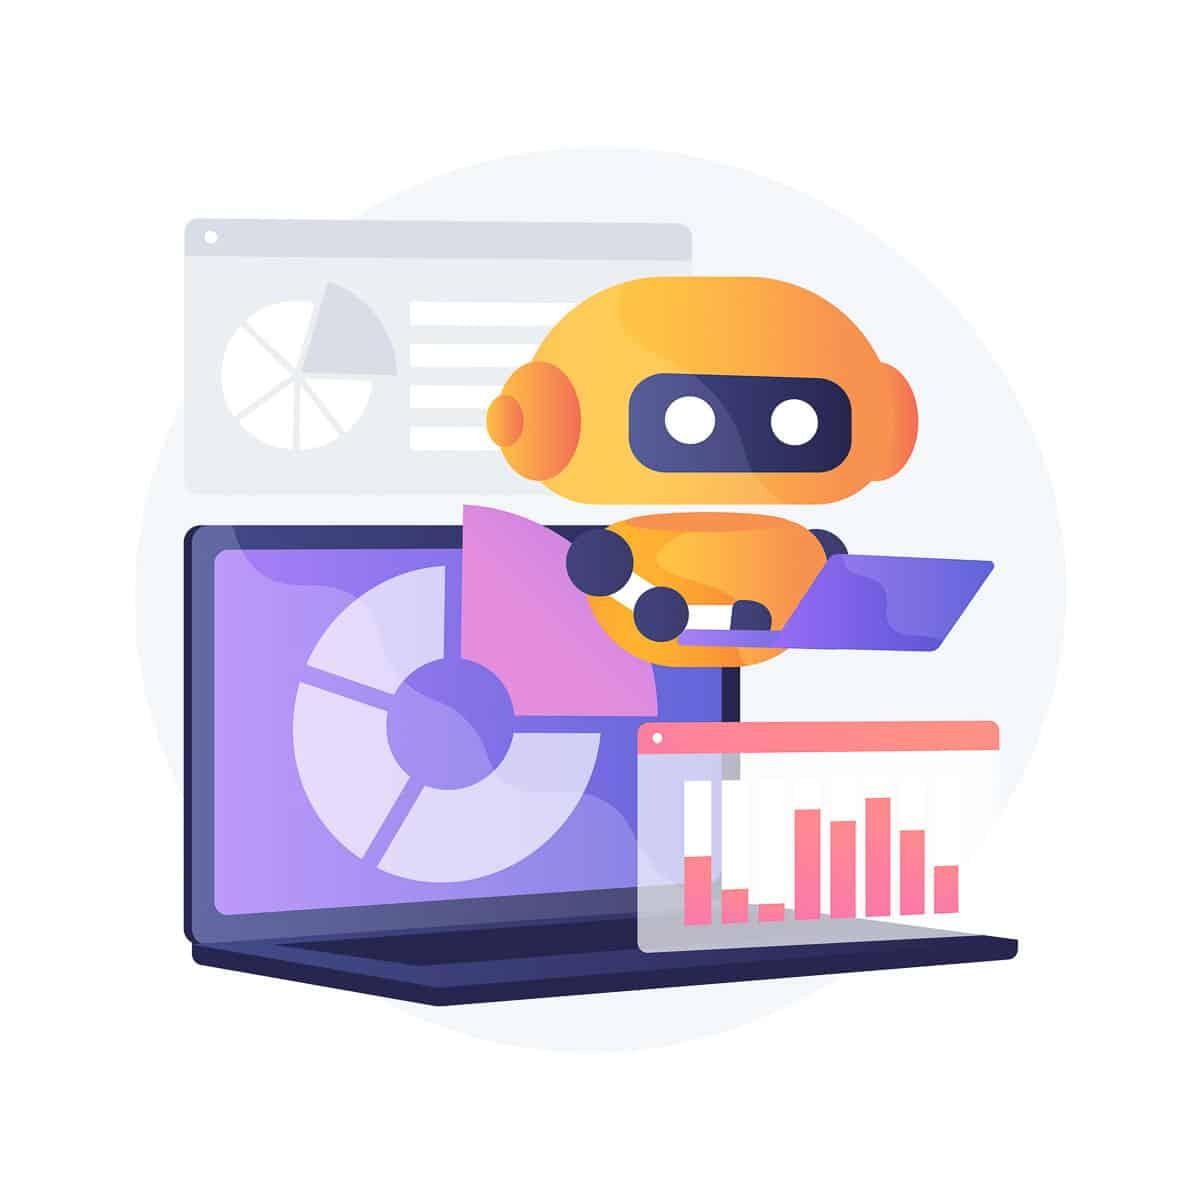 E-Commerce And Digital Marketing tools